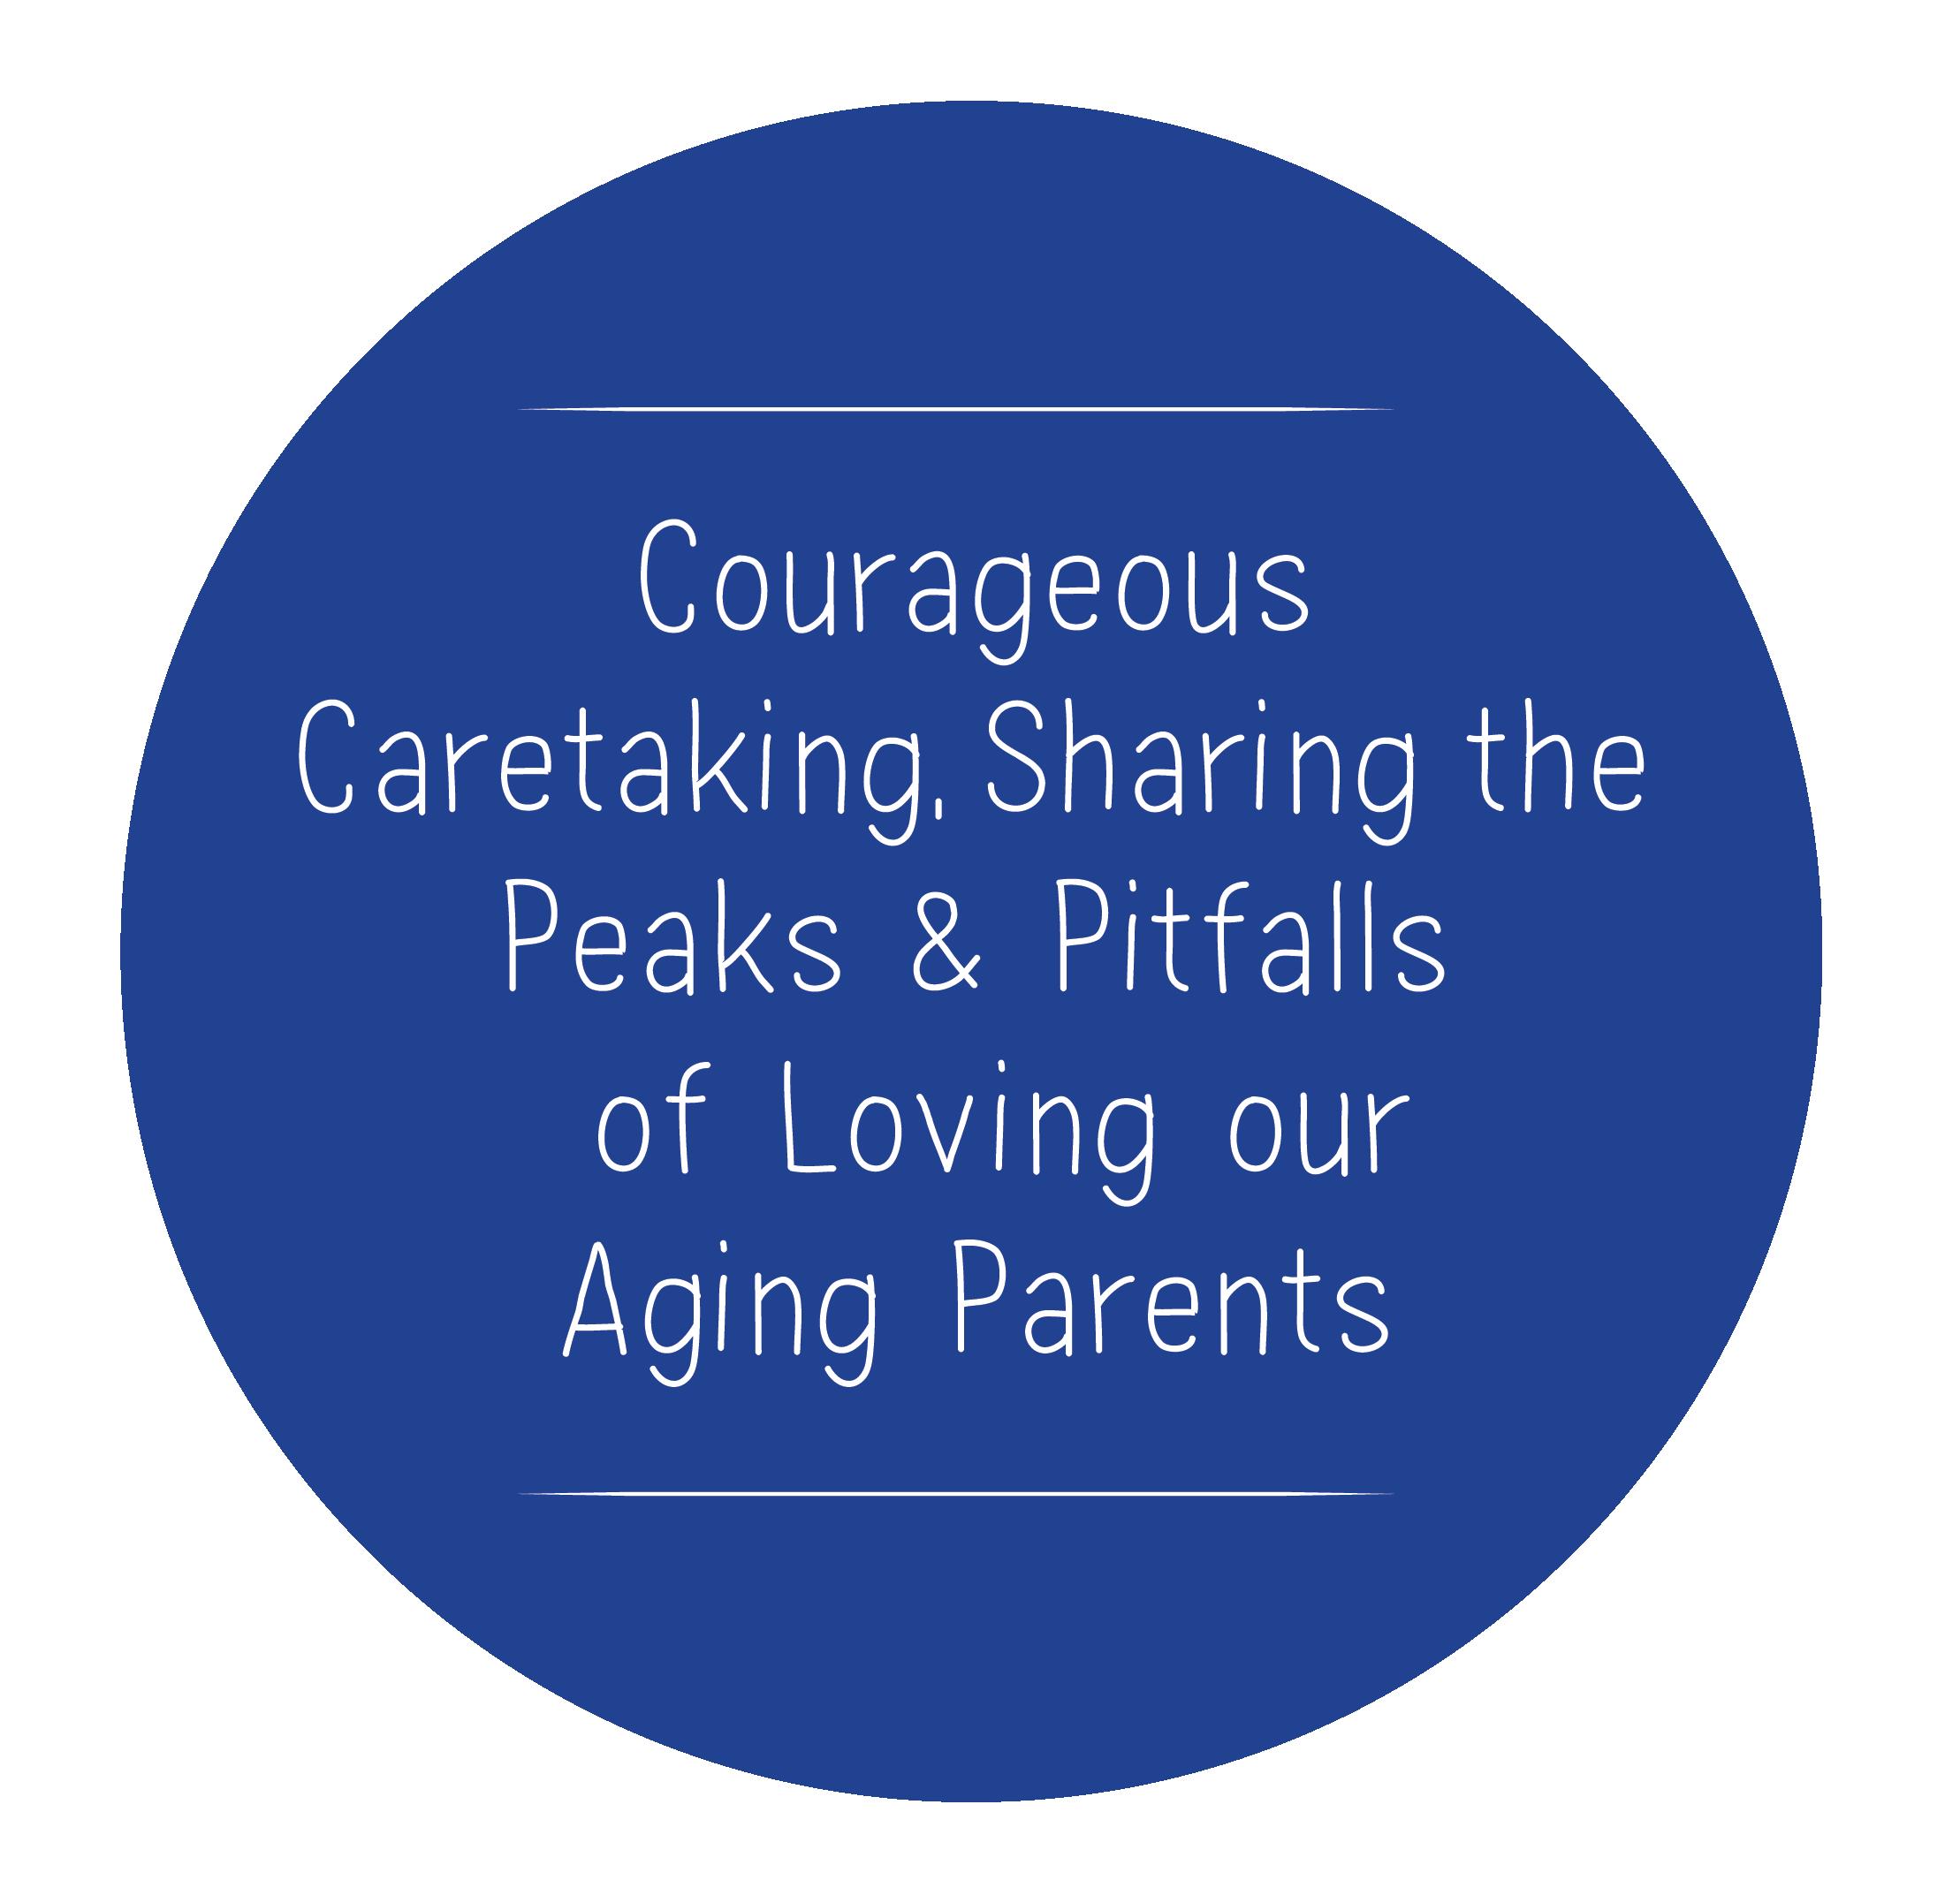 Courageous Caretaking